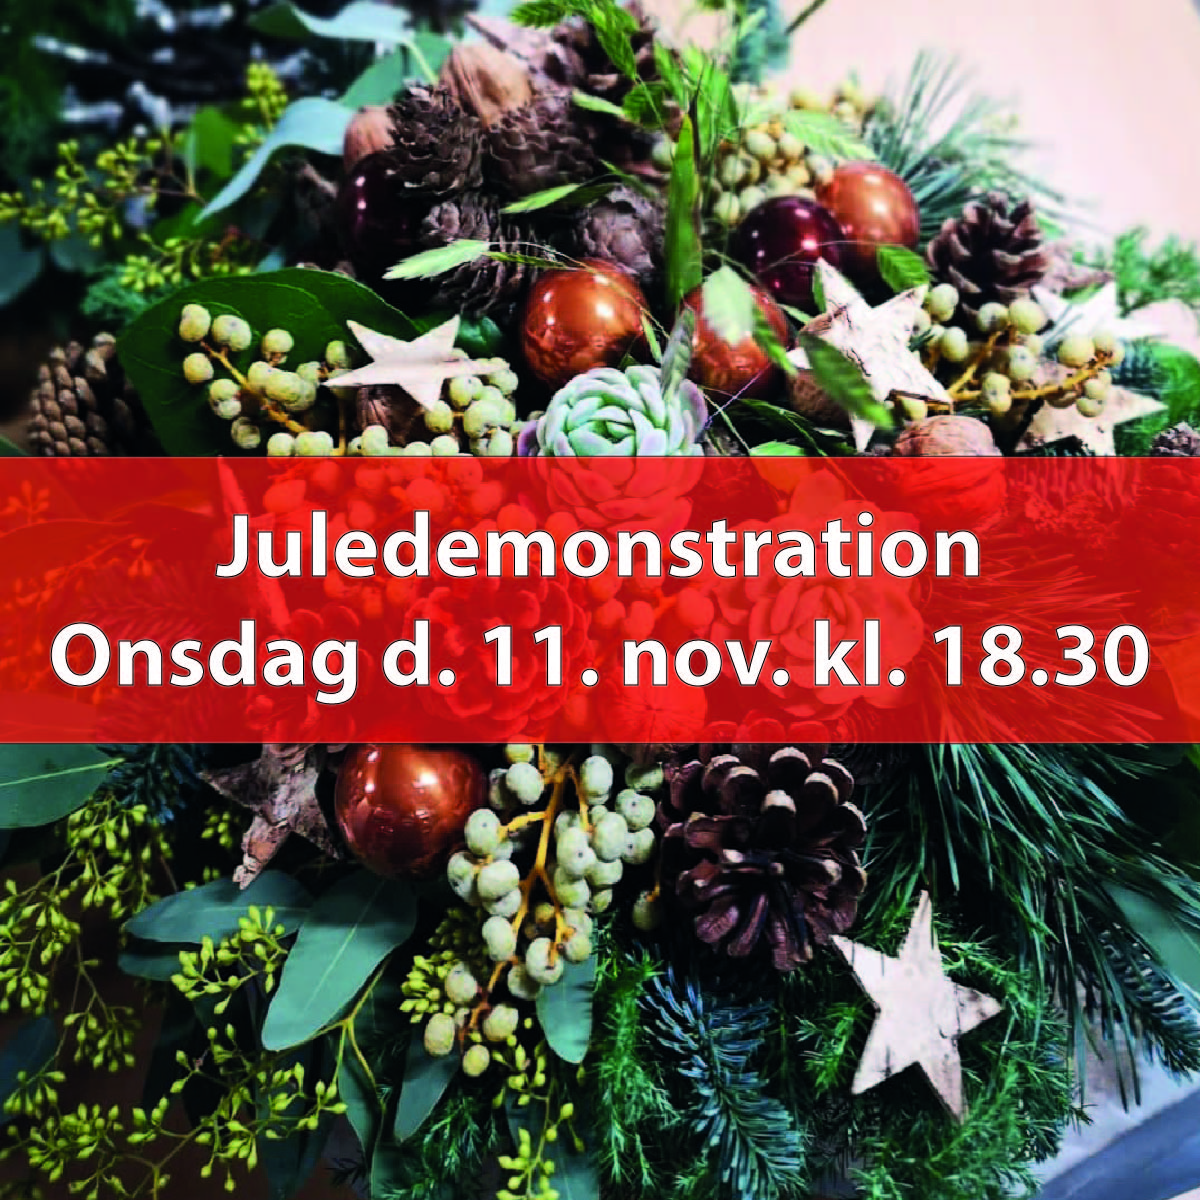 Juledemonstration, Ons. d. 11. nov, kl. 18.30